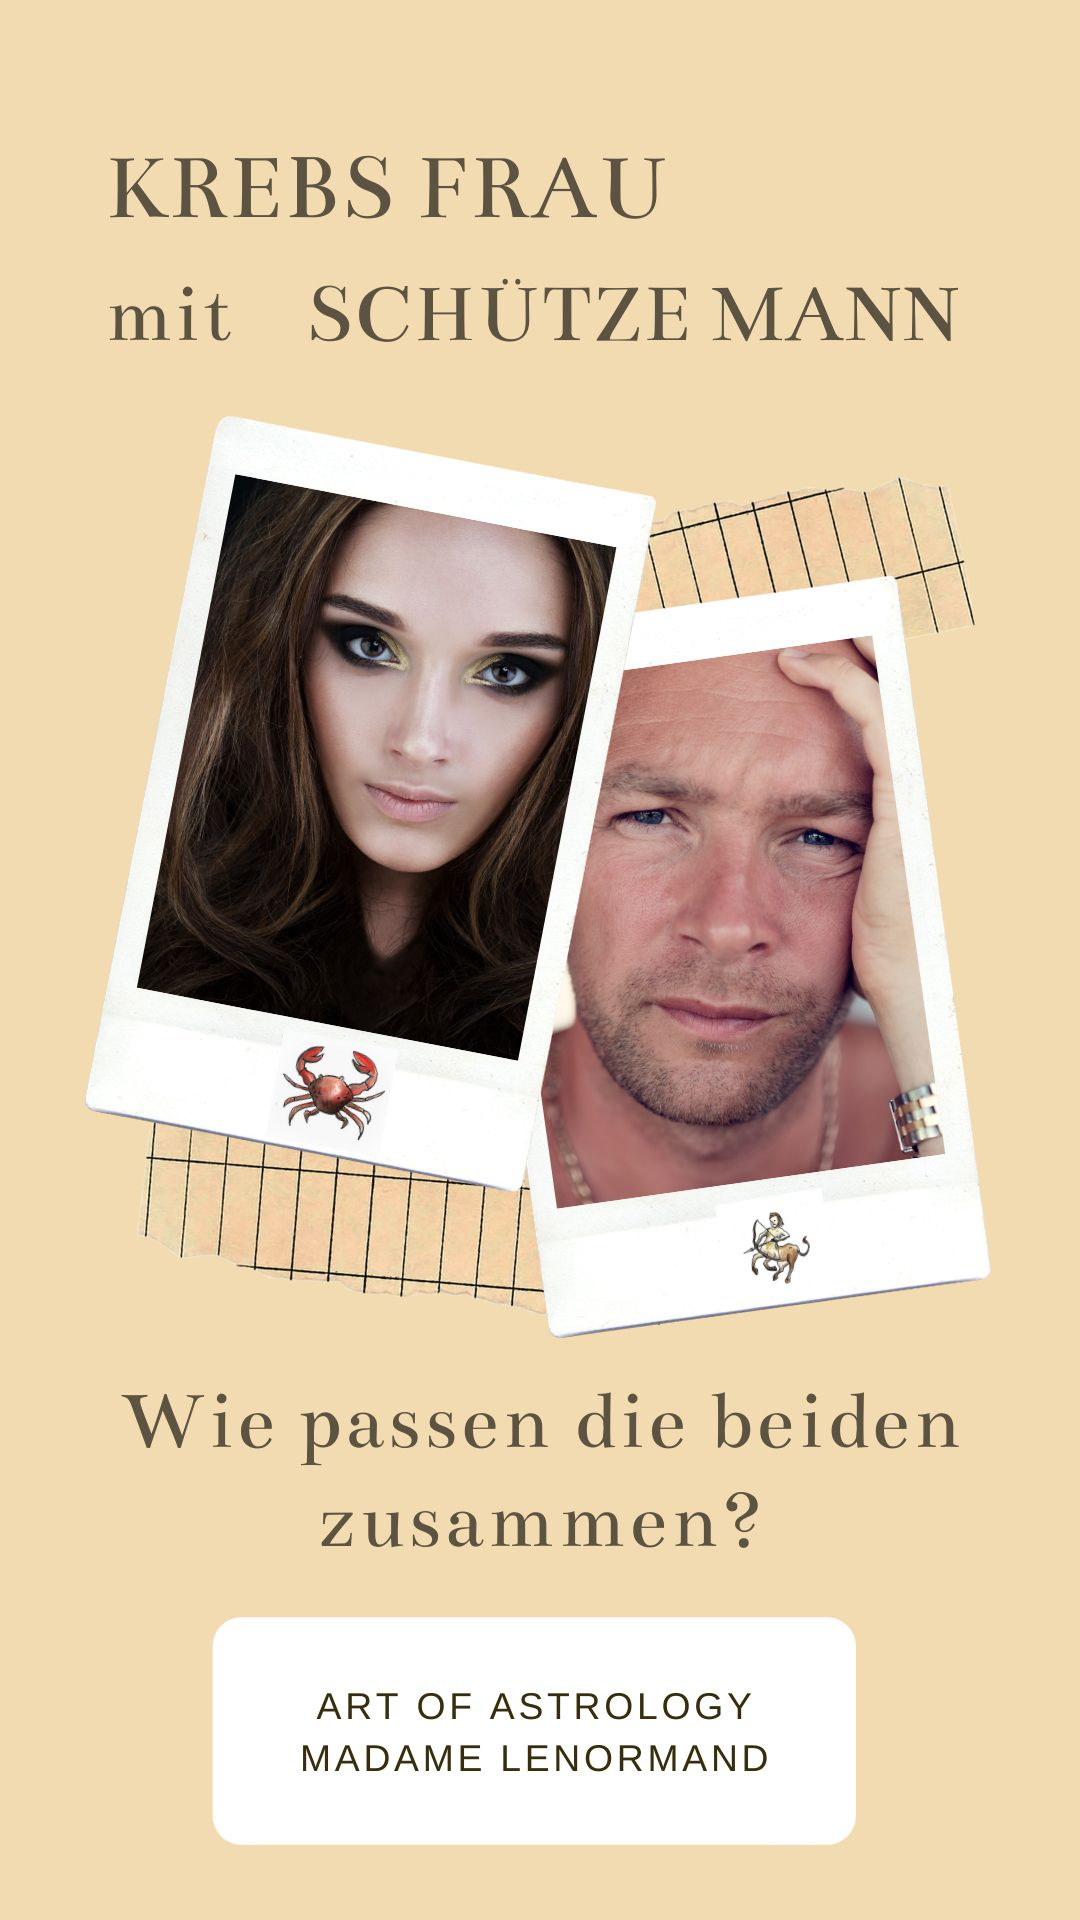 Krebs Frau & Schütze Mann | Schütze mann, Schütze